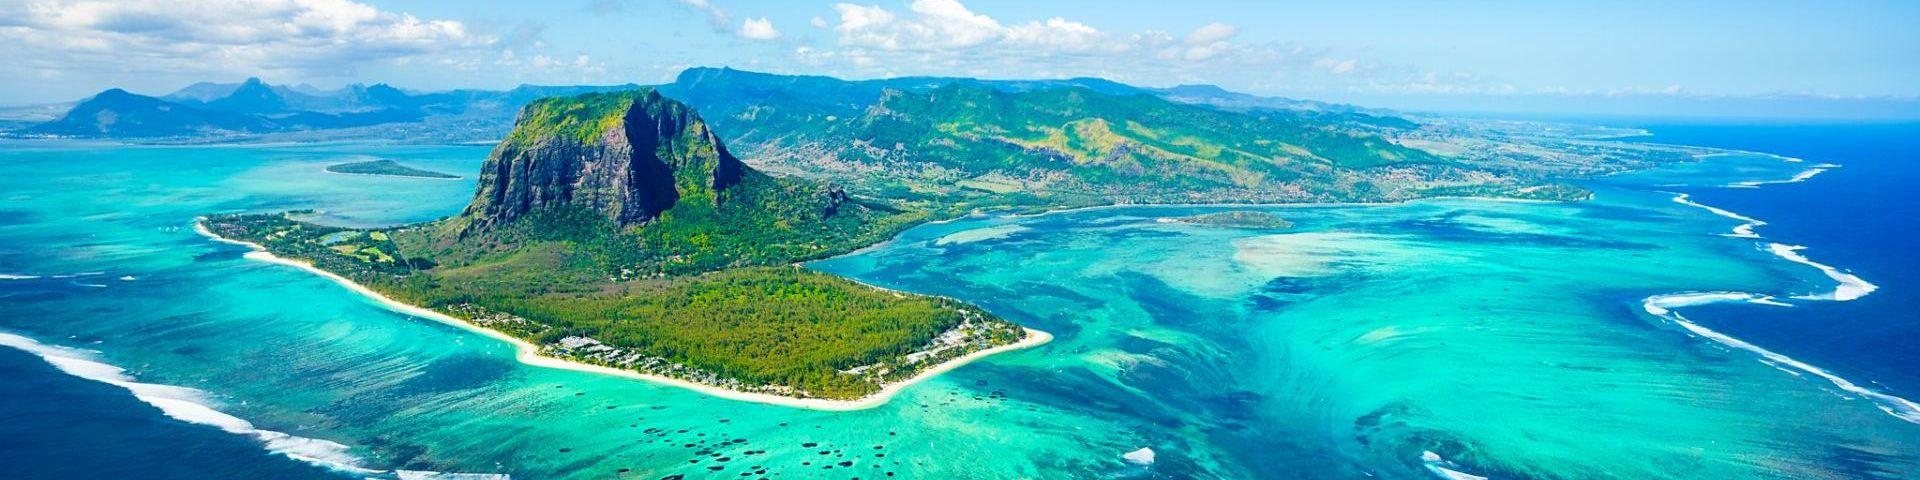 Paradiesische Strände, türkisblaues Meer